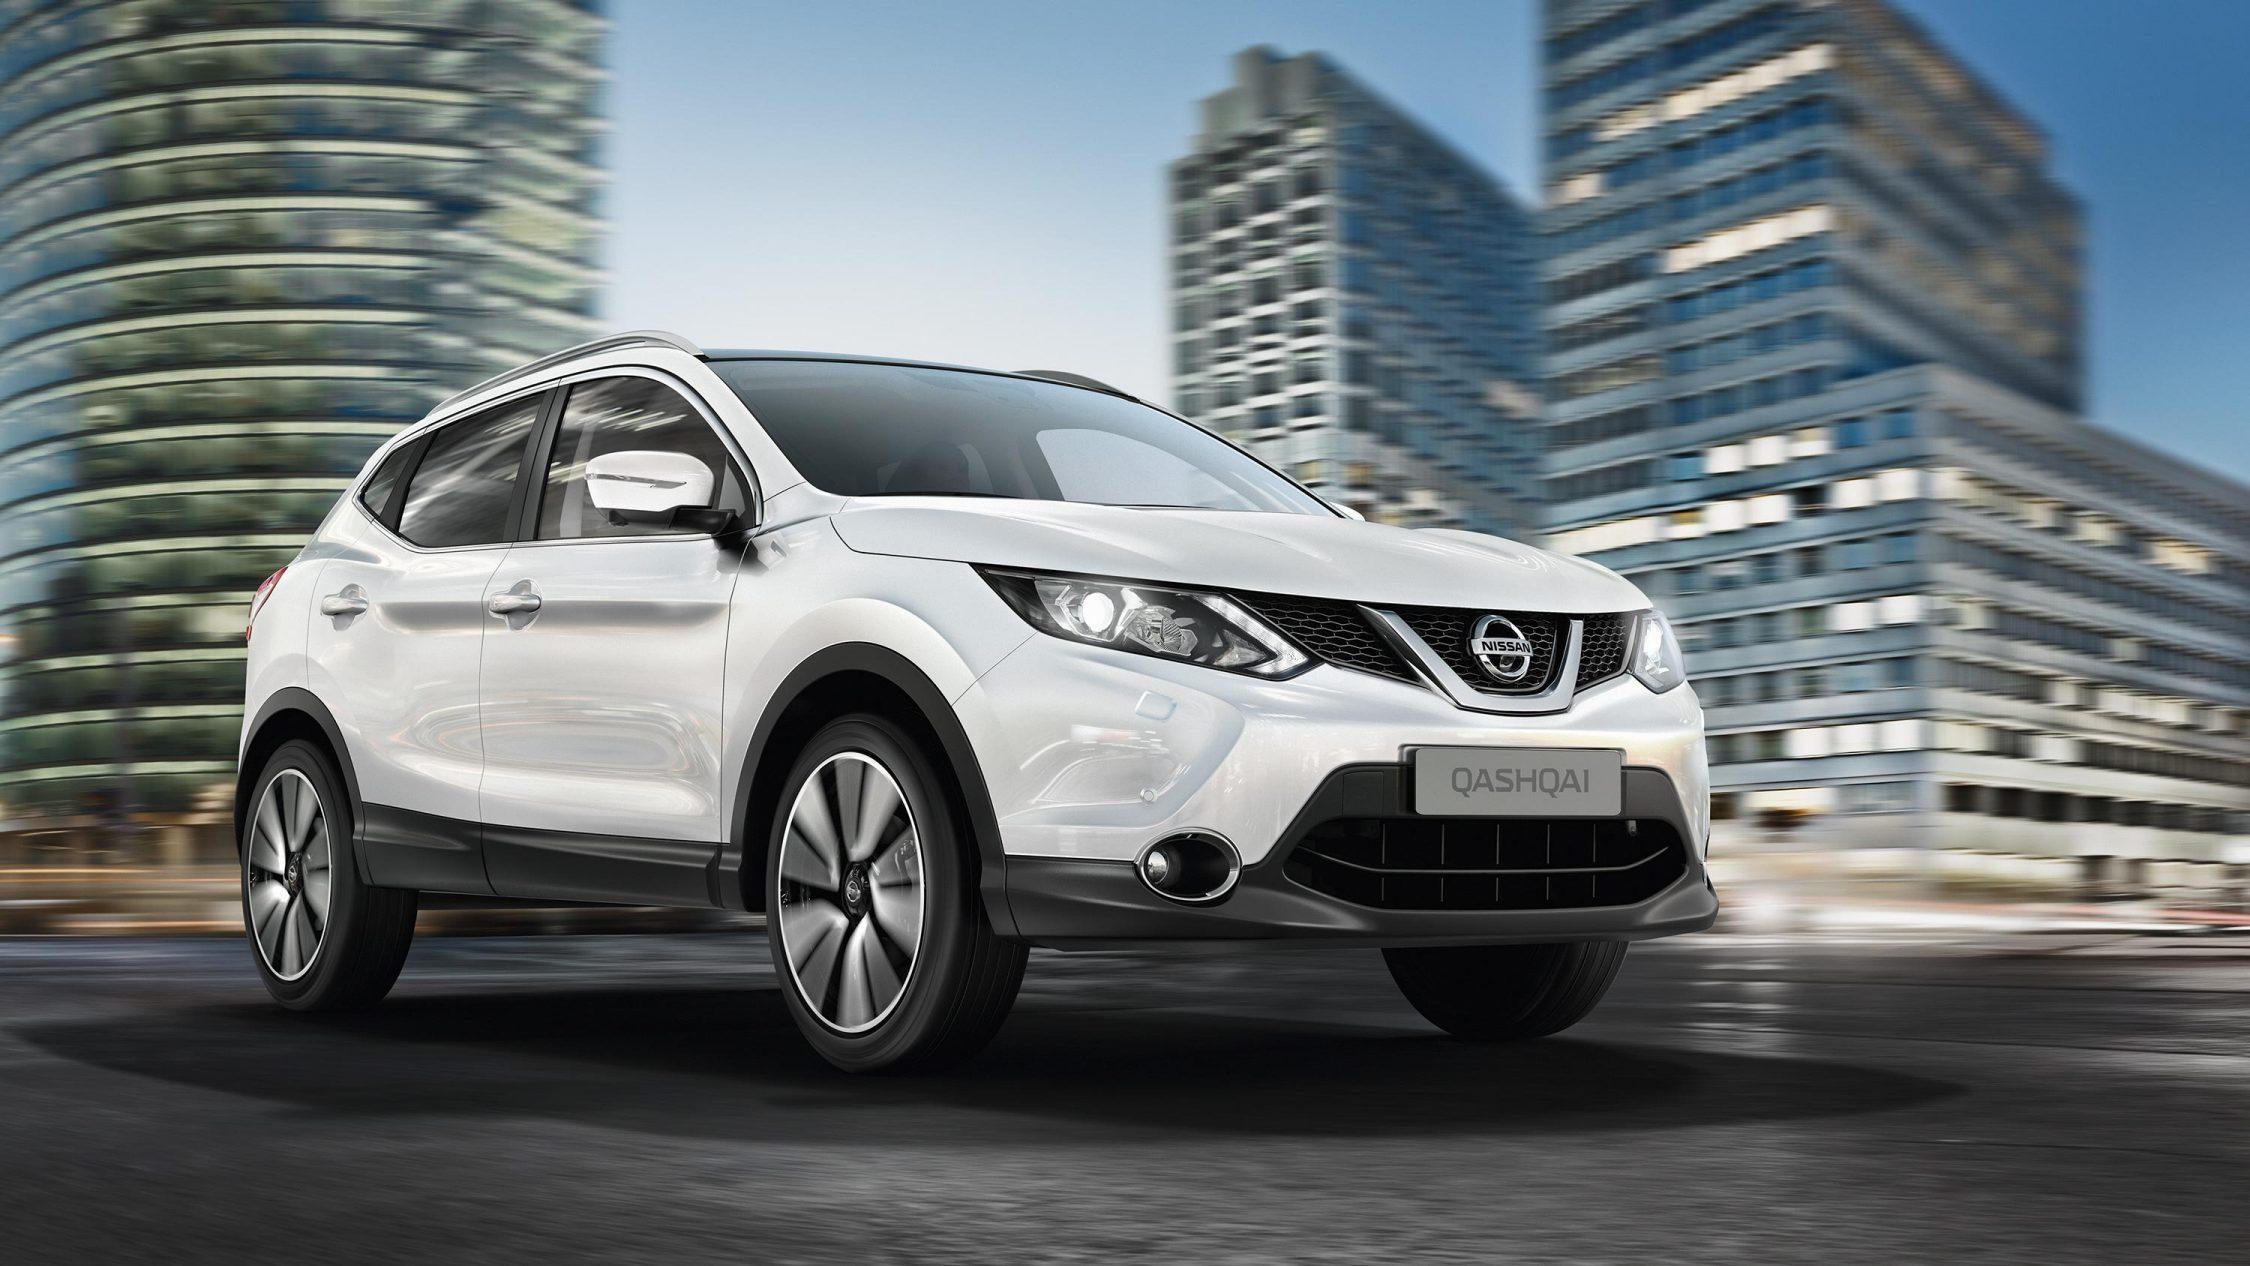 Nissan QASHQAI белого цвета— вид спереди с разворотом 3/4